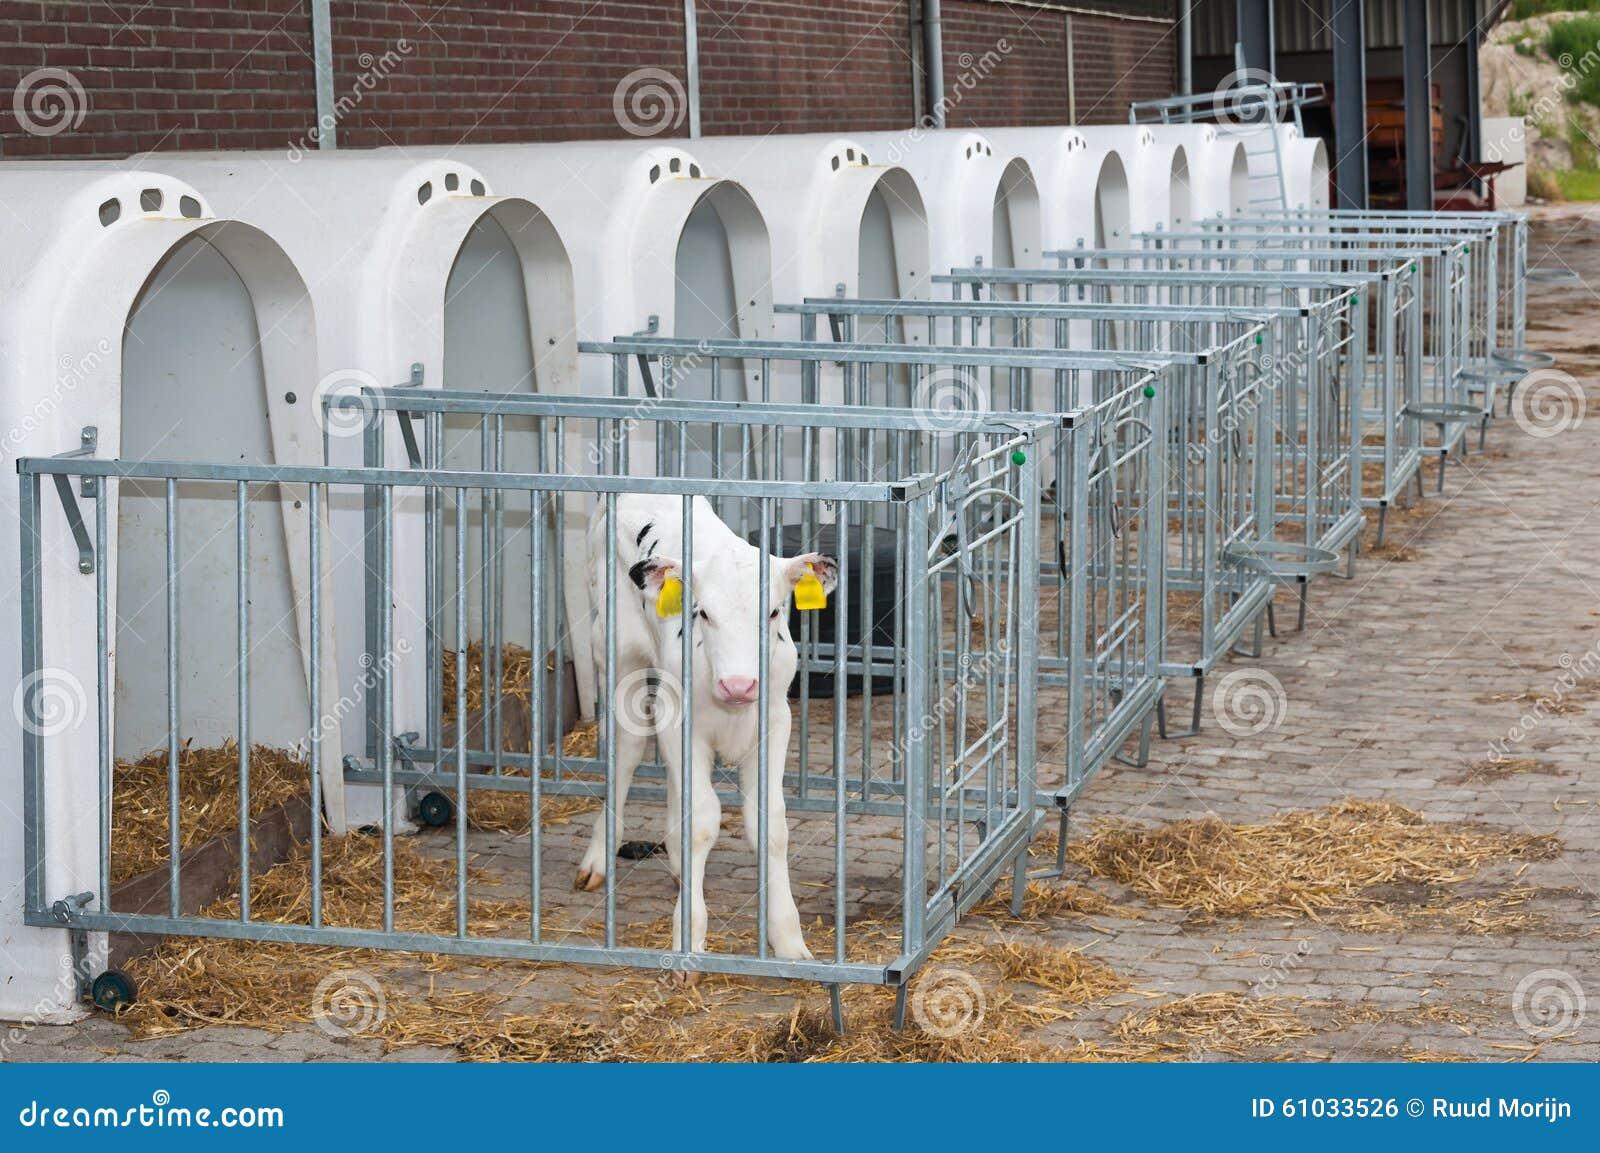 Newborn Calf Stands Next To The Calf Pen Stock Photo